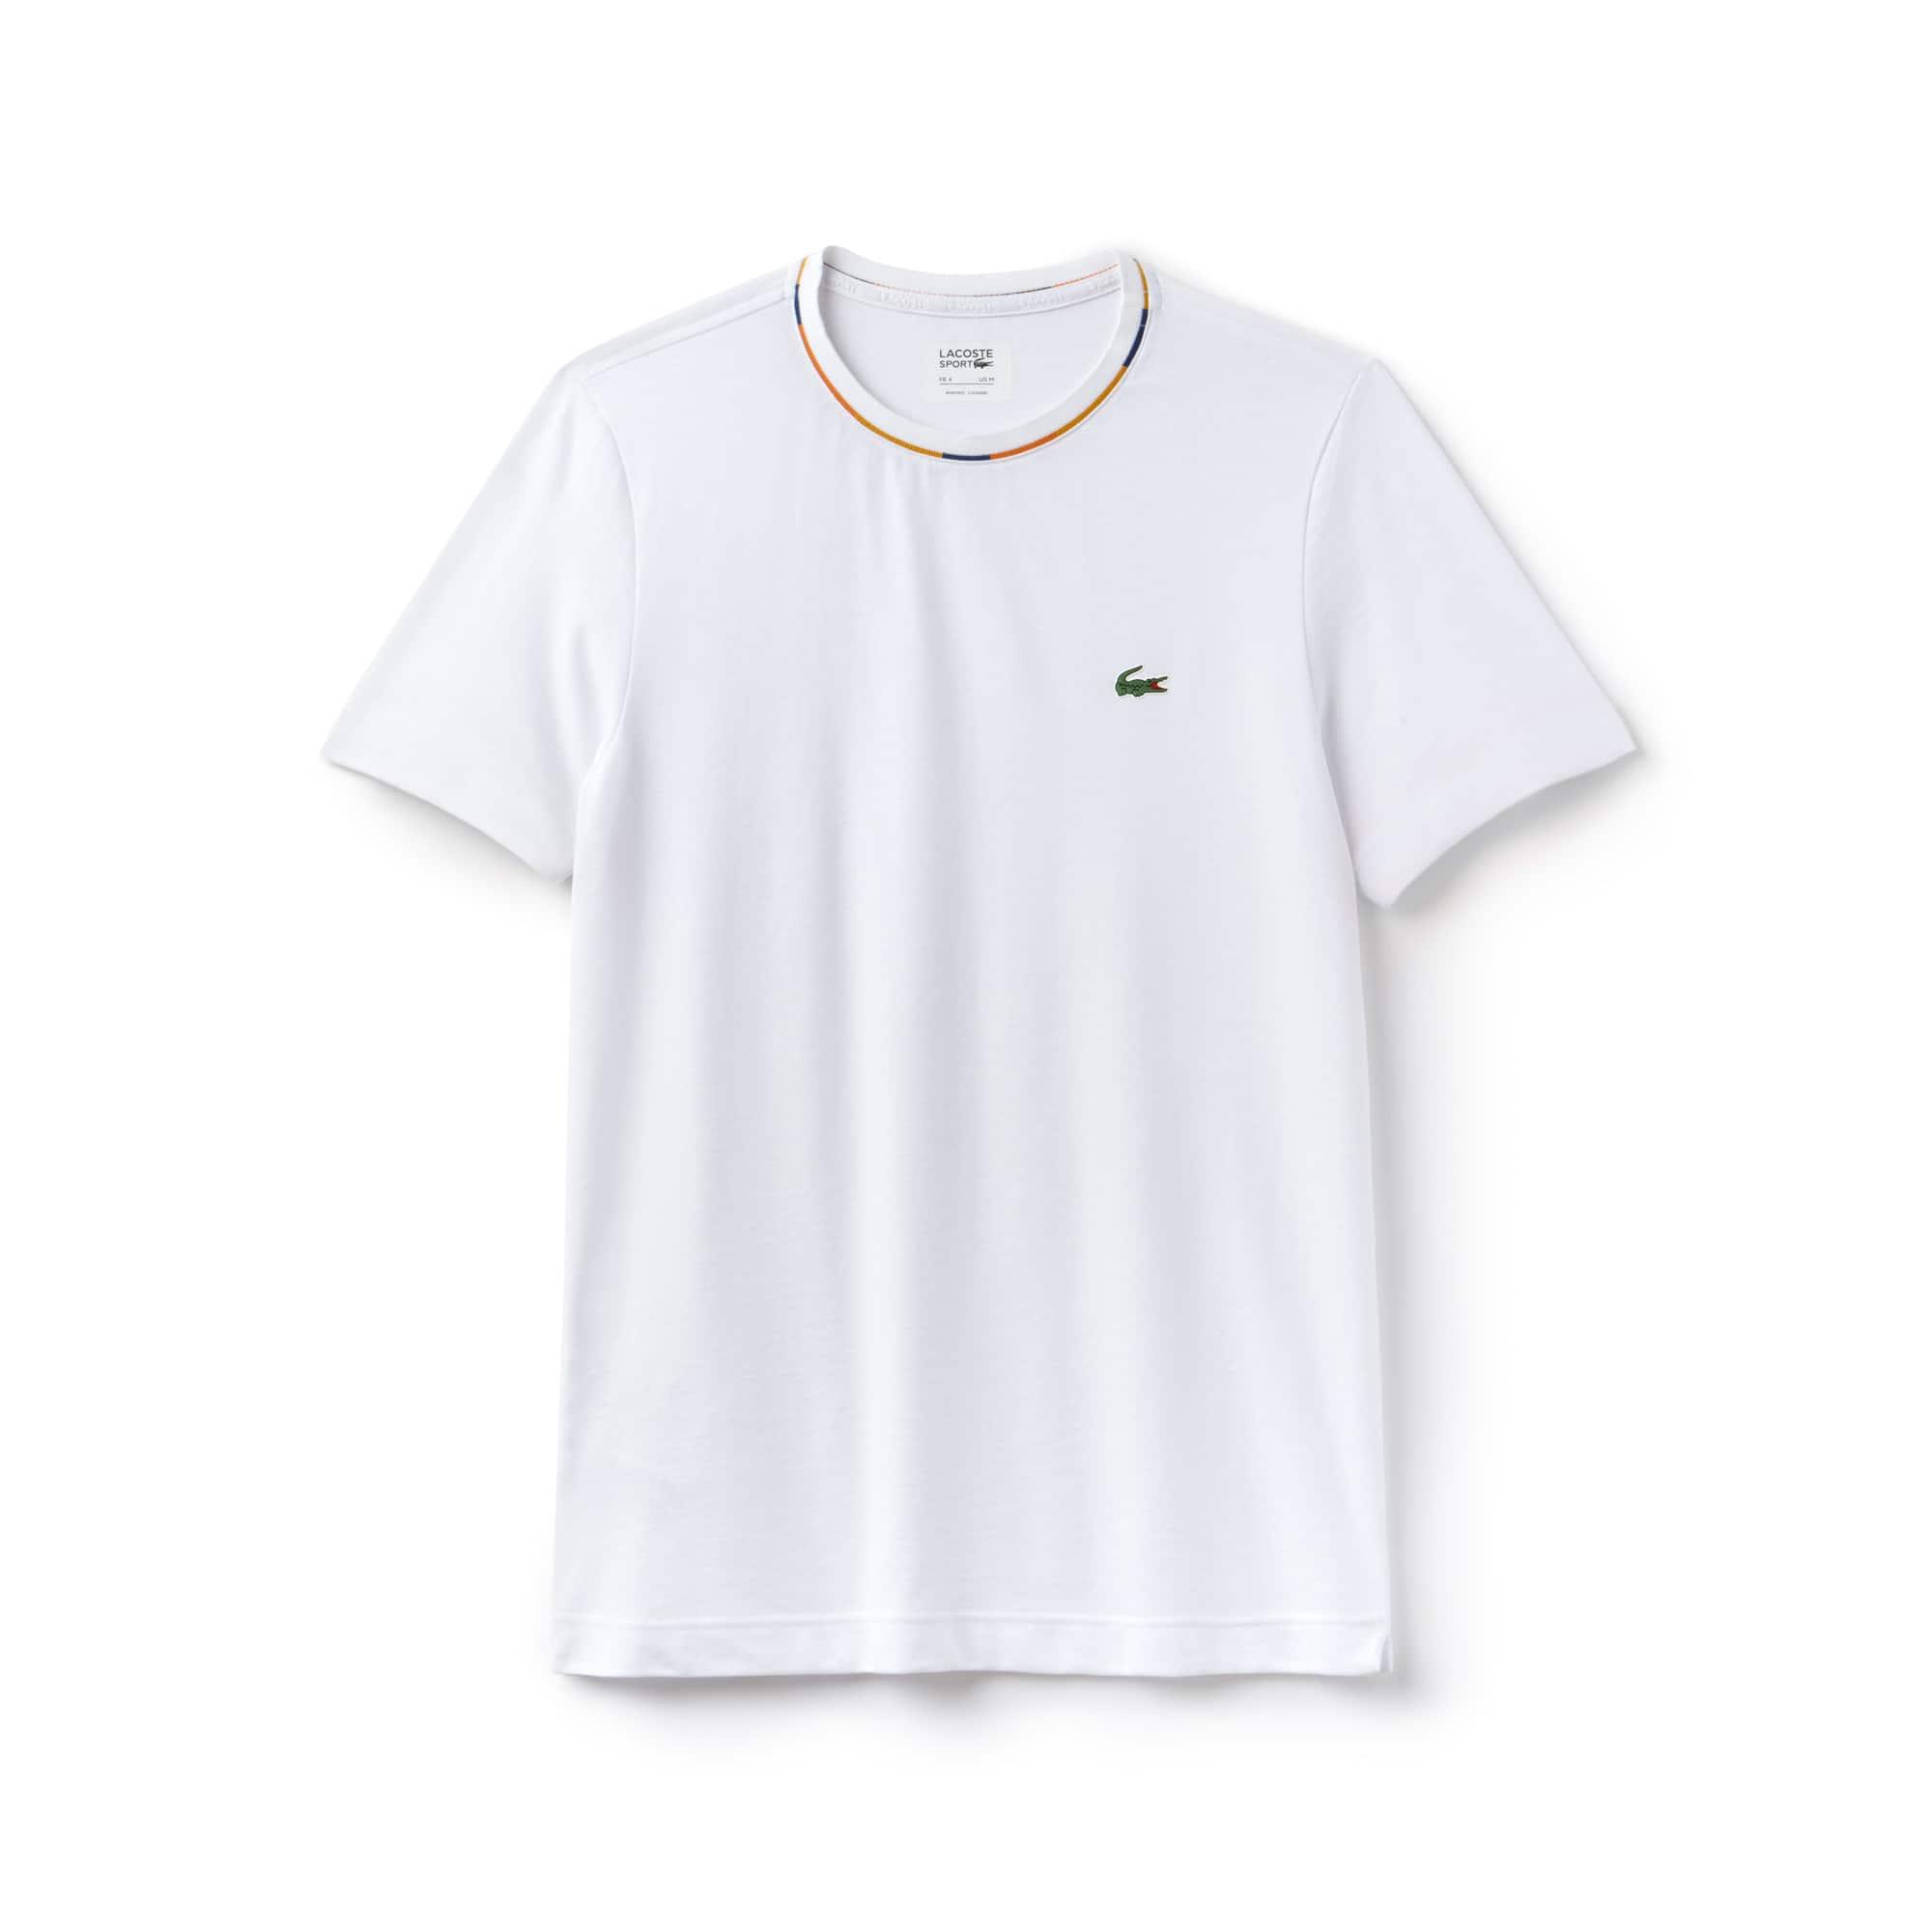 Men's SPORT Jacquard Piqué Tennis T-Shirt